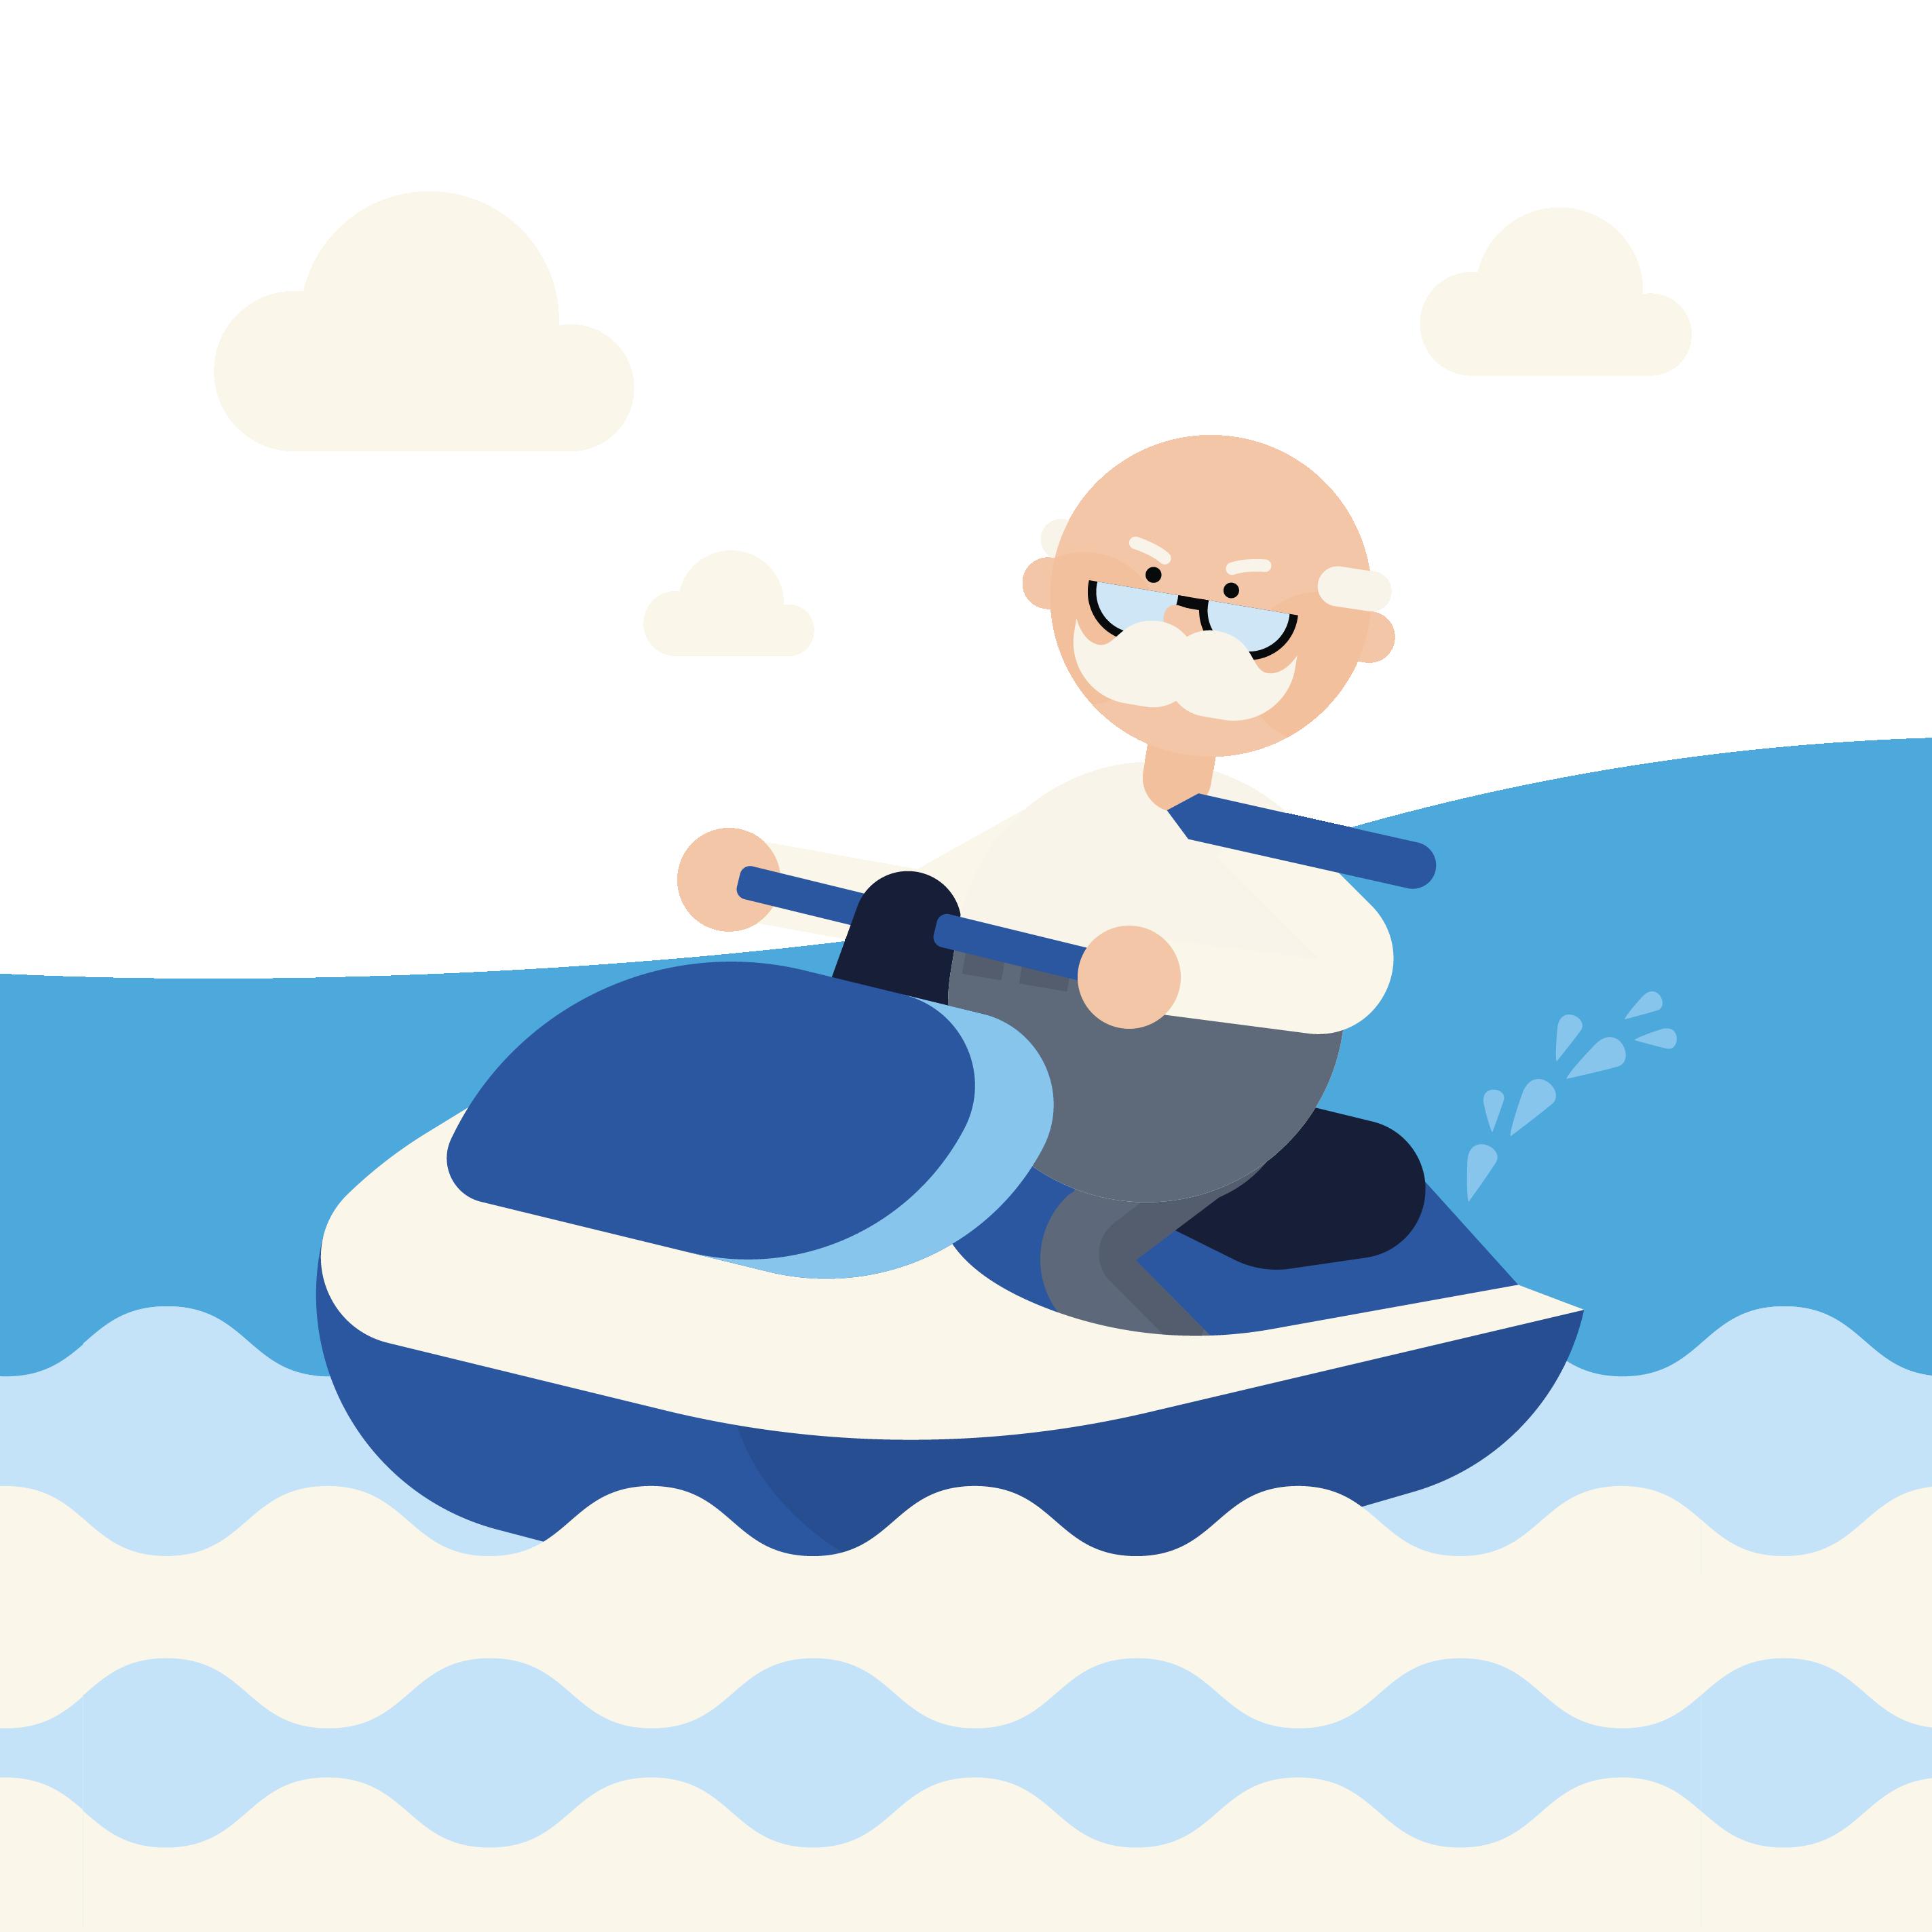 scientist riding on jet ski